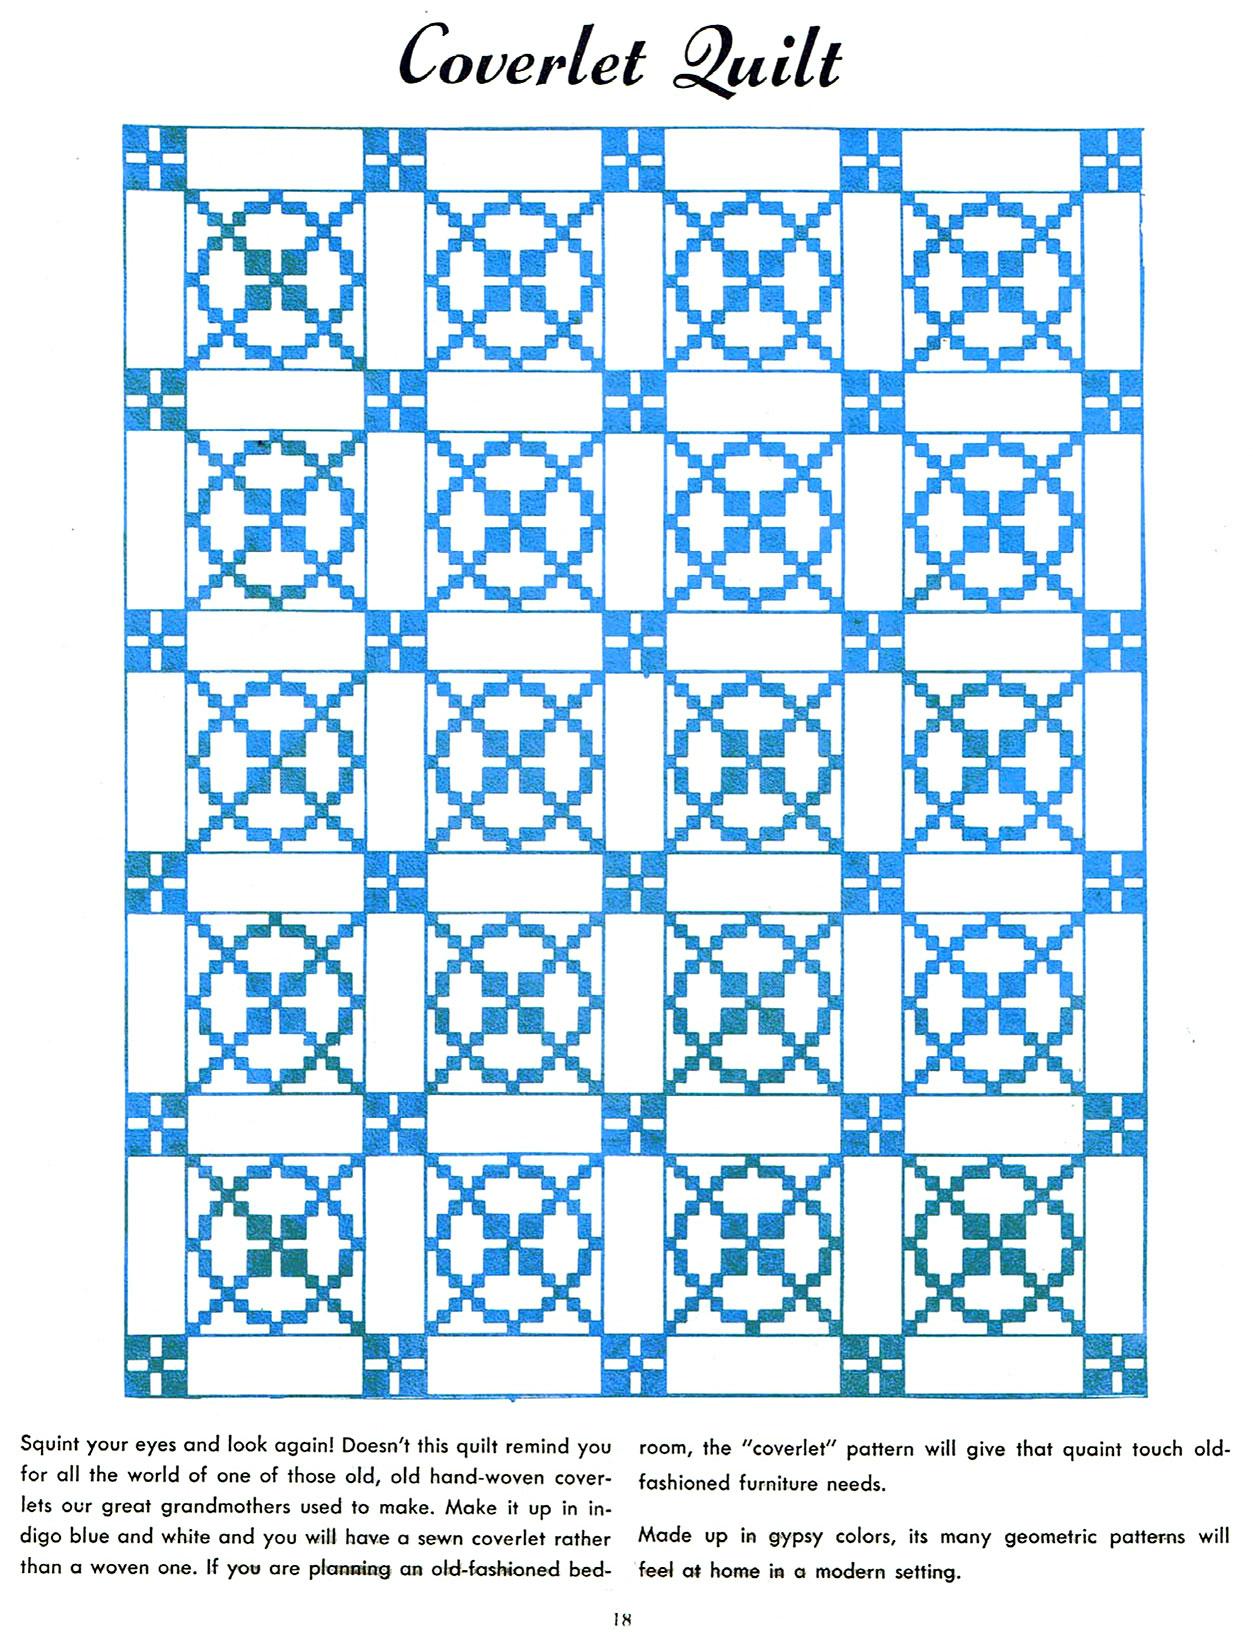 http://qisforquilter.com/wp-content/uploads/2012/11/Sixteen-Blue-Ribbon-Quilts-20.jpg